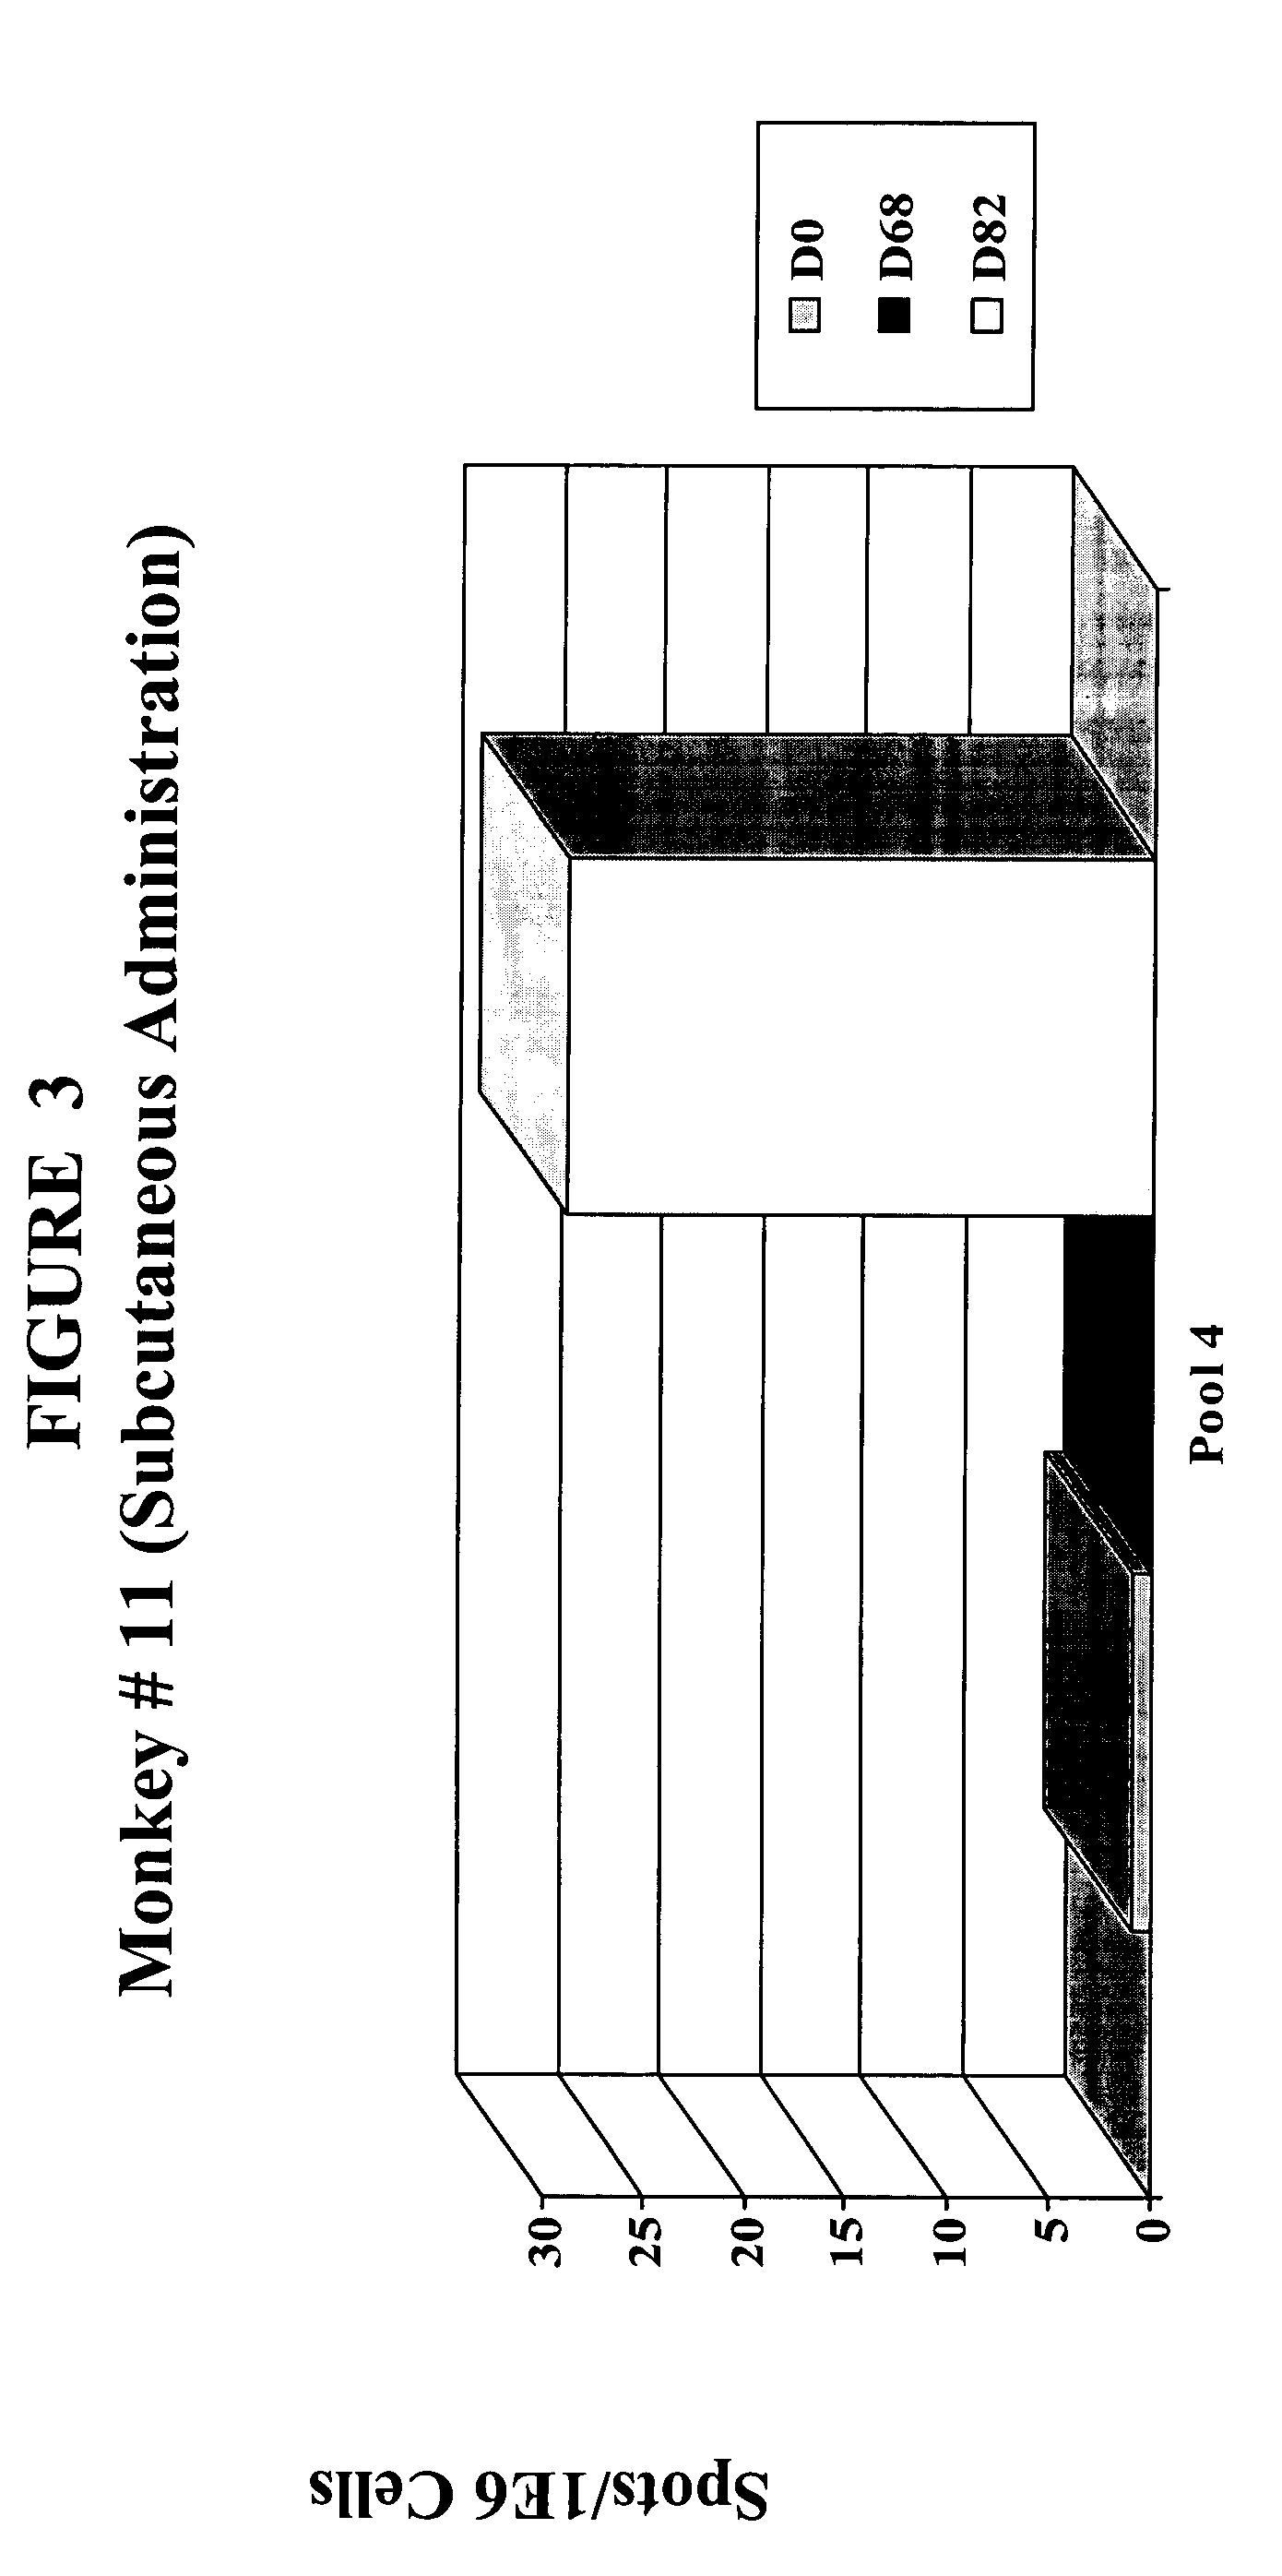 Design with Vinyl 1369 3 US V SOS 1369 3 16 x 40 Black